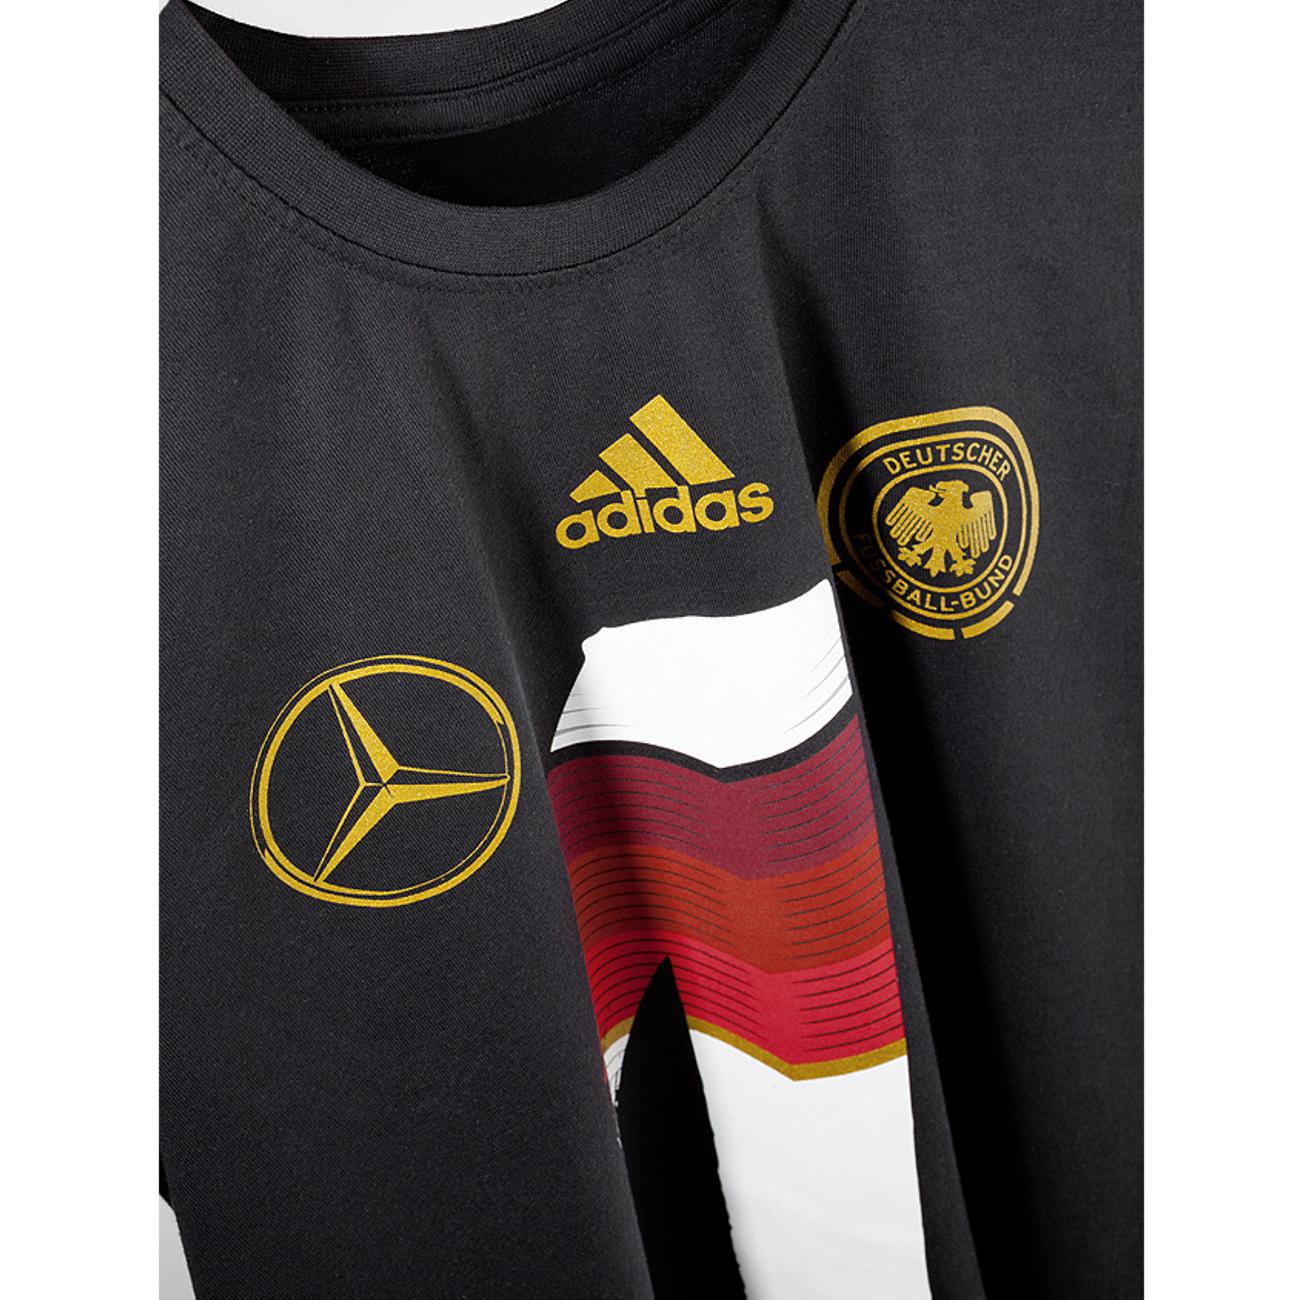 original mercedes benz t shirt adidas dfb damen homecoming. Black Bedroom Furniture Sets. Home Design Ideas